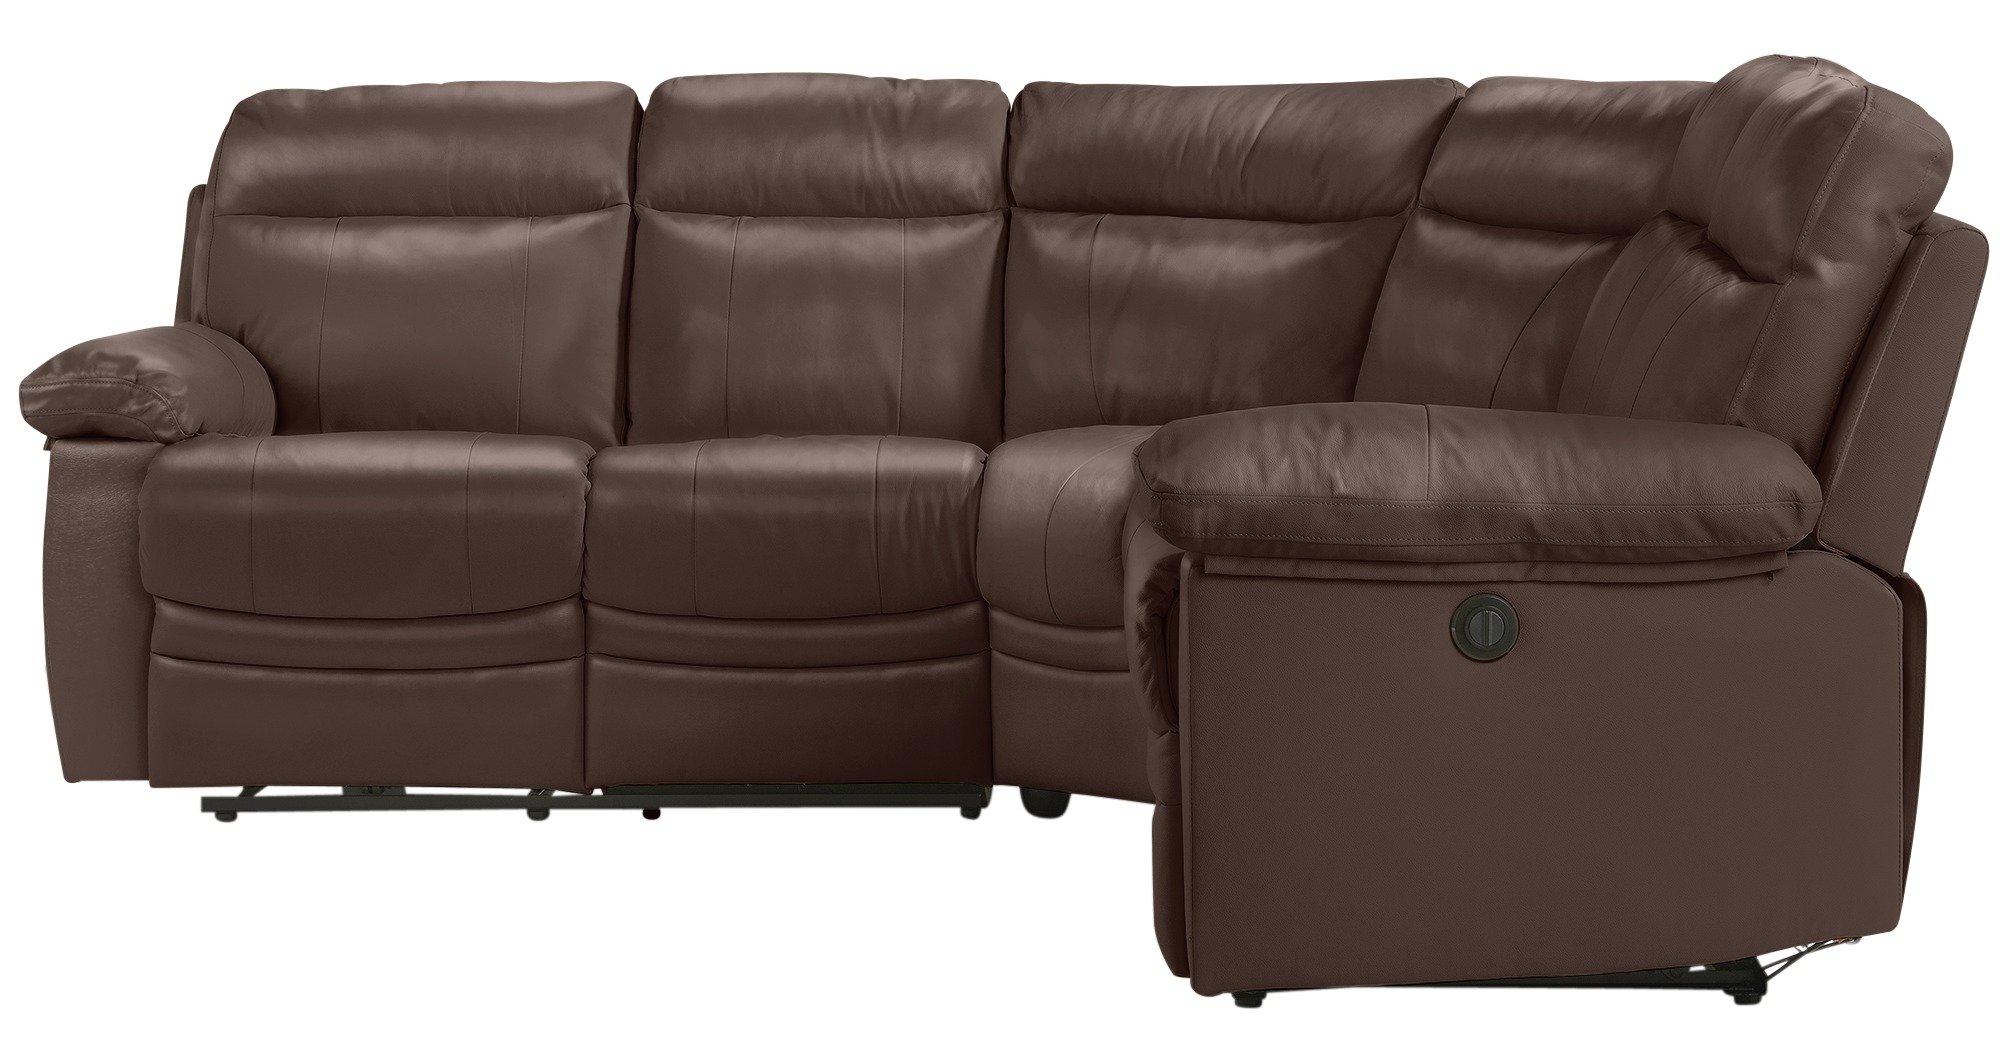 argos recliner sofa ashley millennium dexpen saddle power paulo leather corner group chocolate